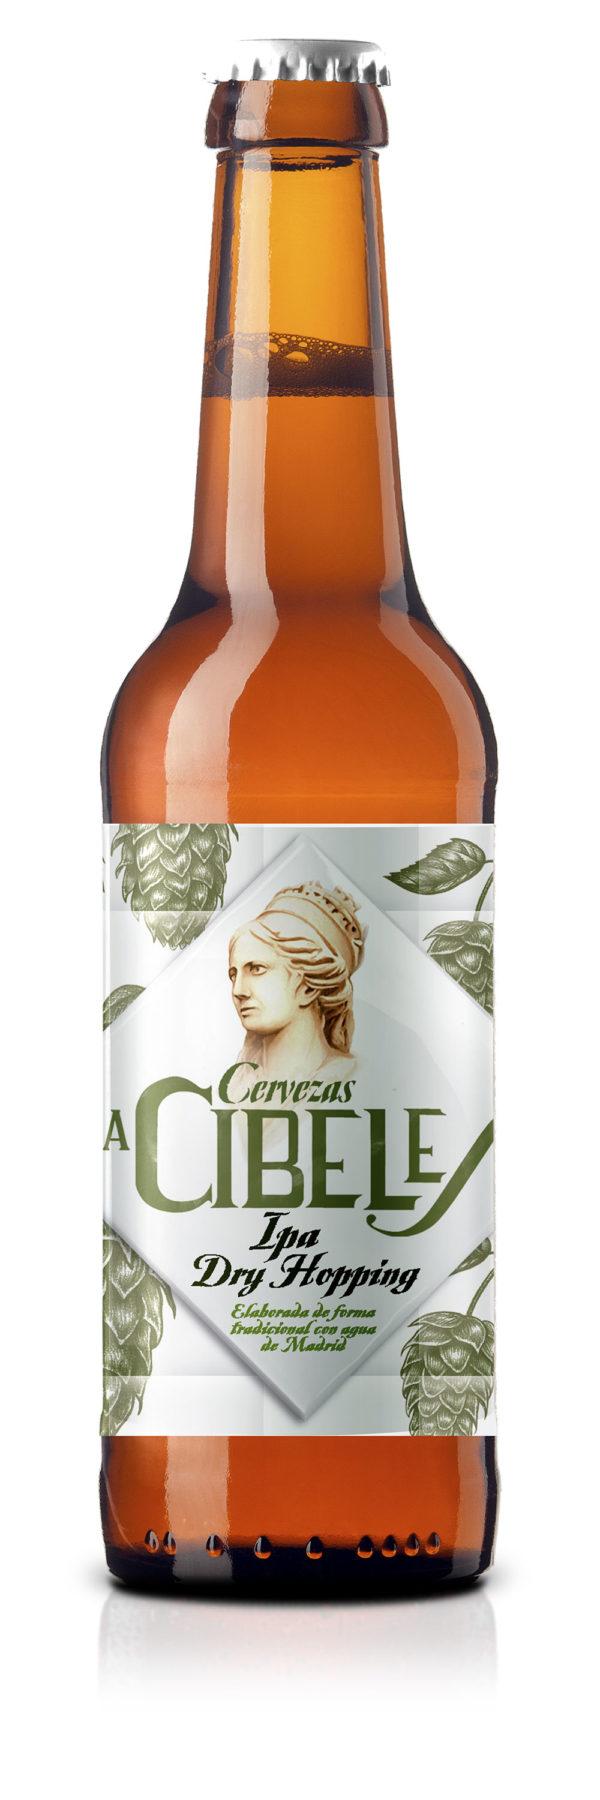 La Cibeles IPA Dry